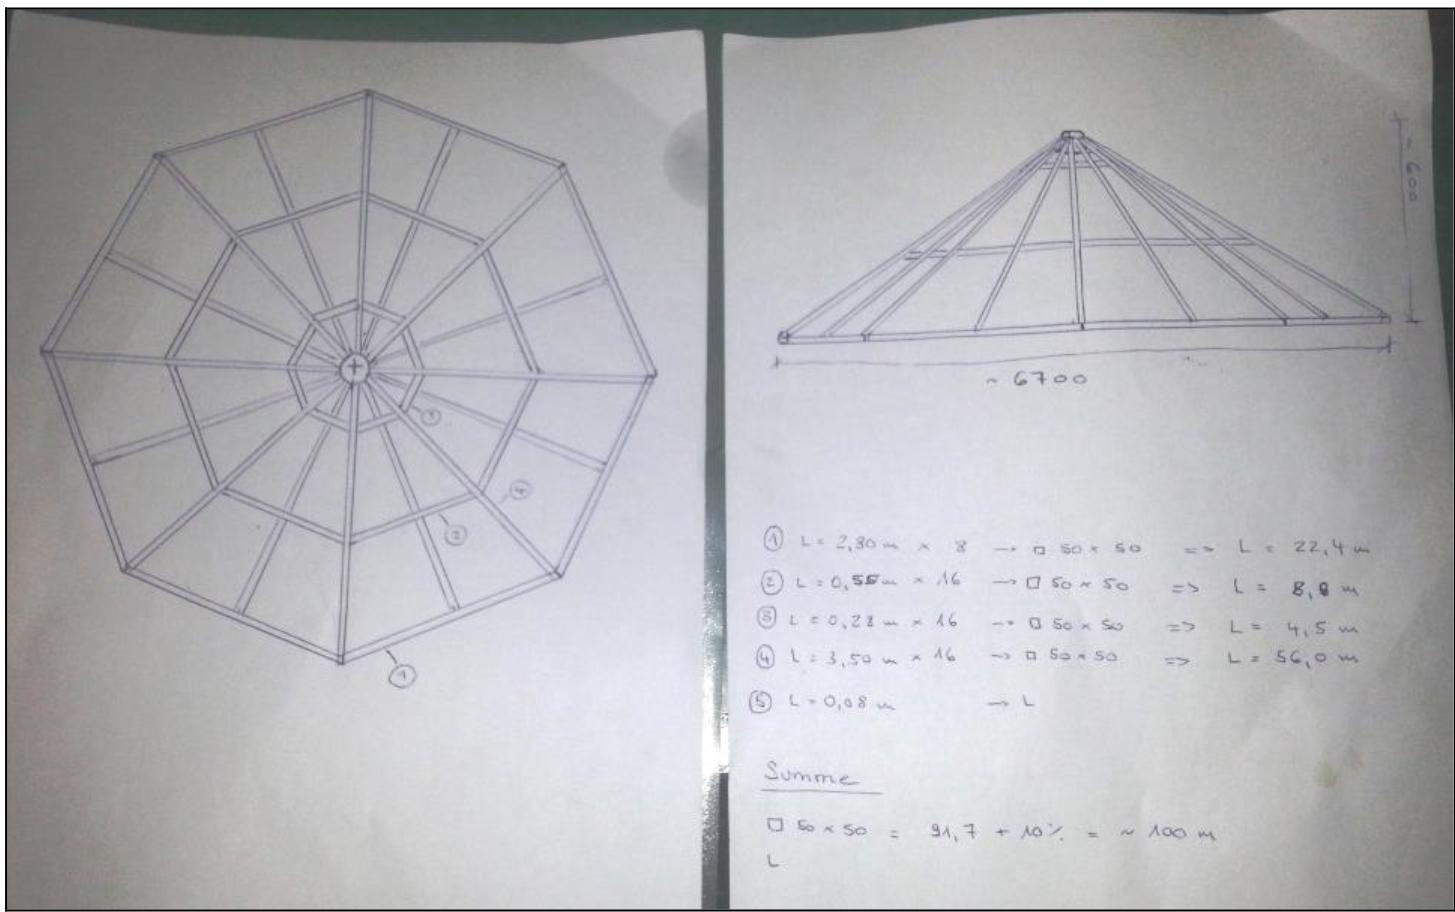 Skizze der Dachkonstruktion des Bantaba